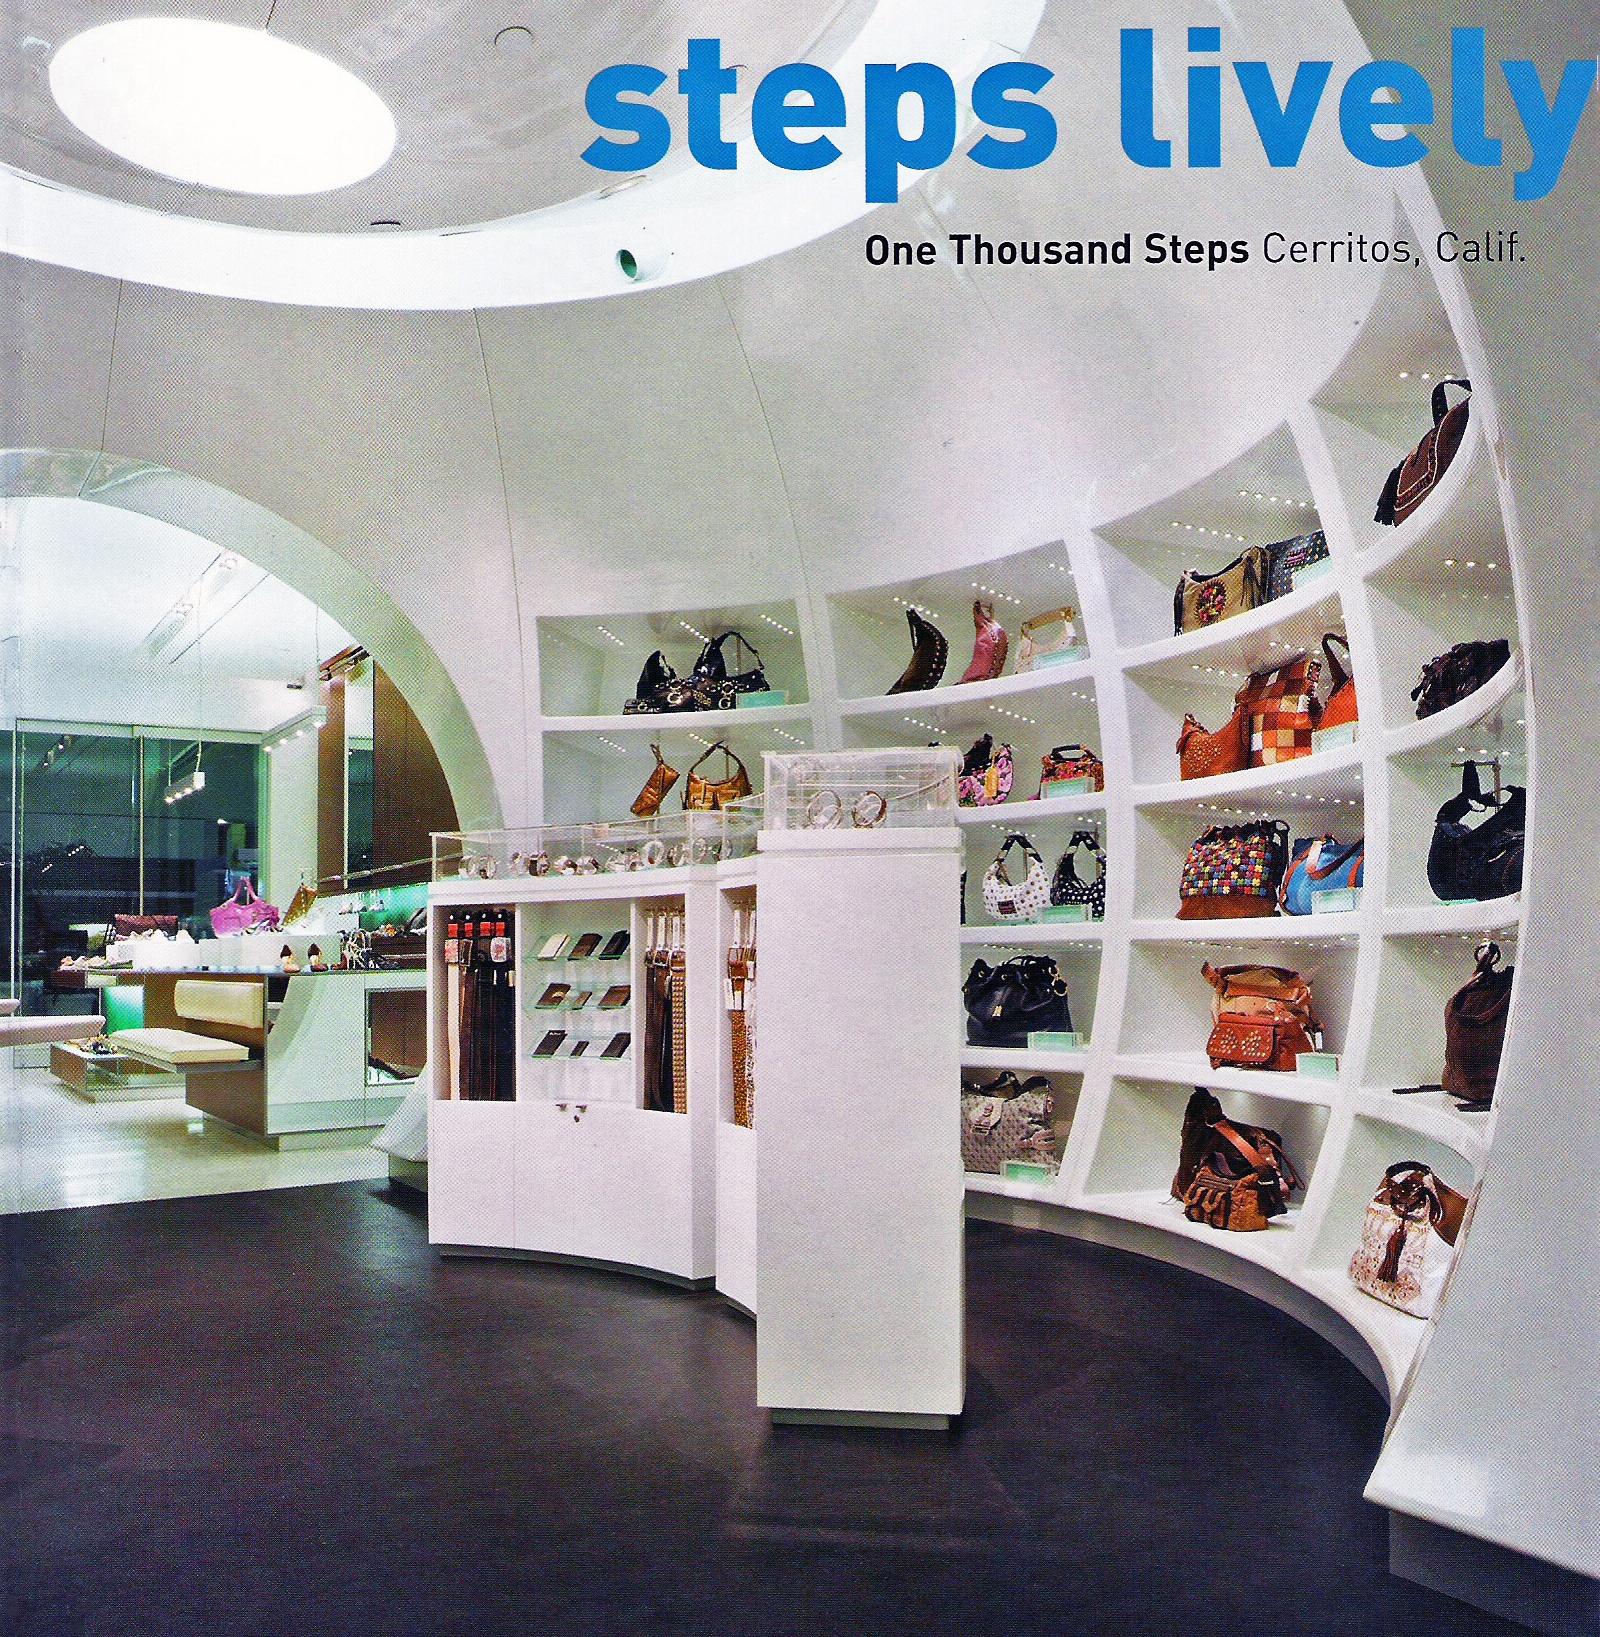 1000 Steps Retail Store